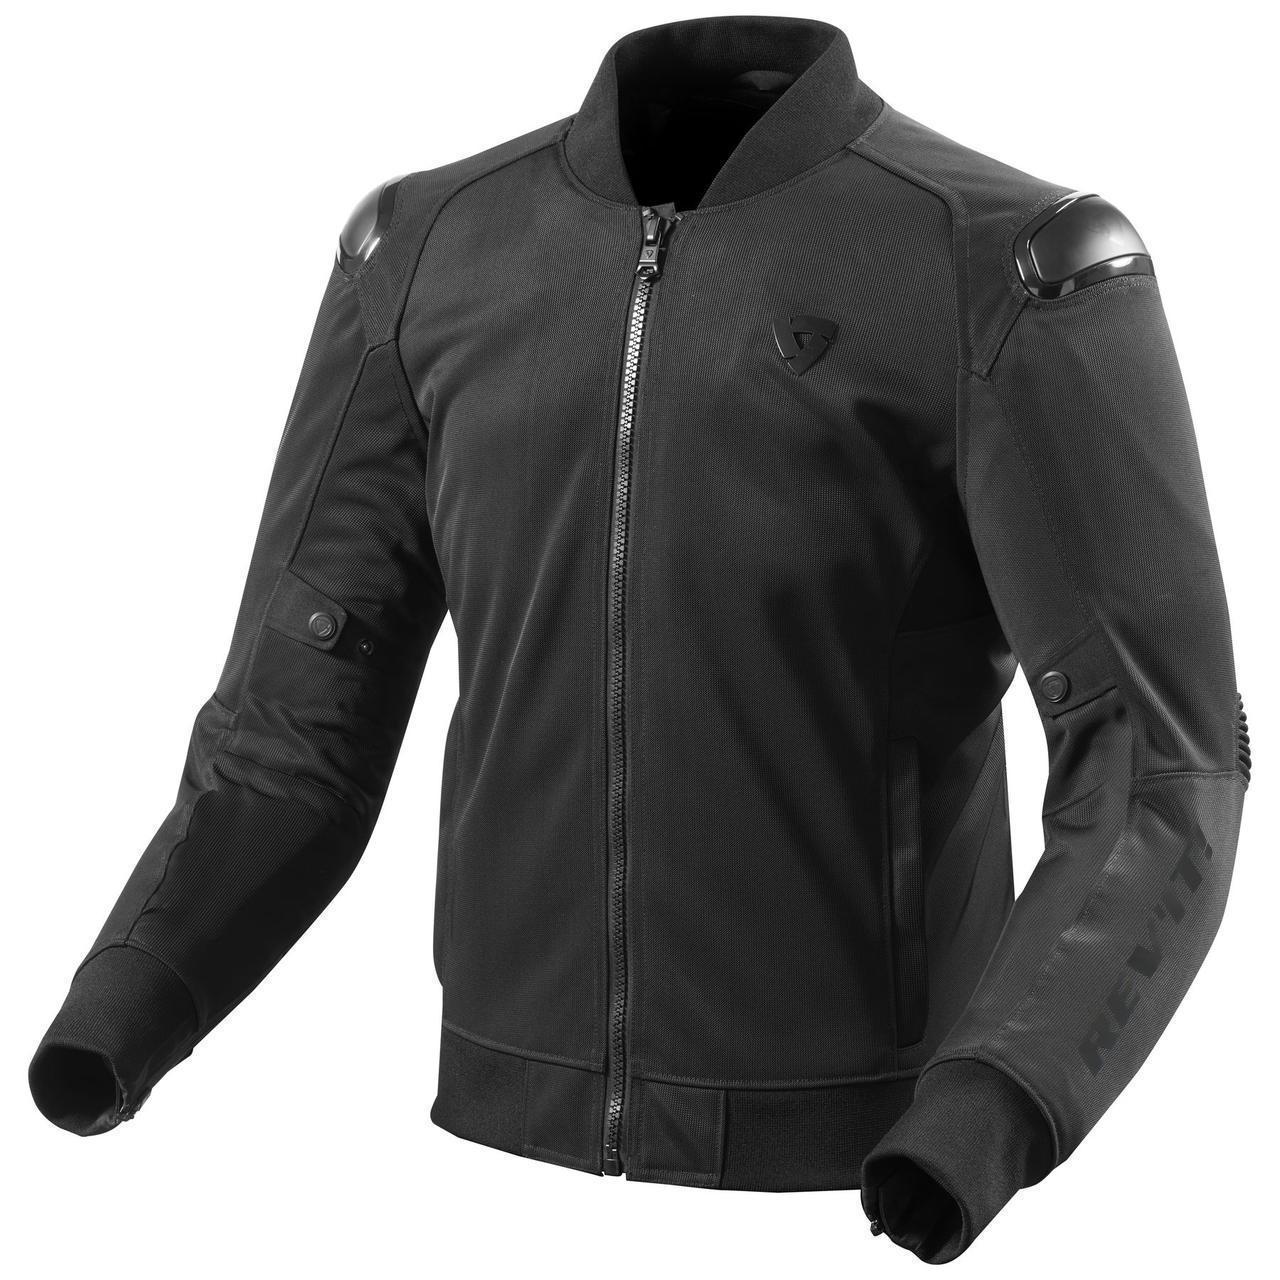 Мотокуртка Revit TRACTION текстиль р. 2XL black